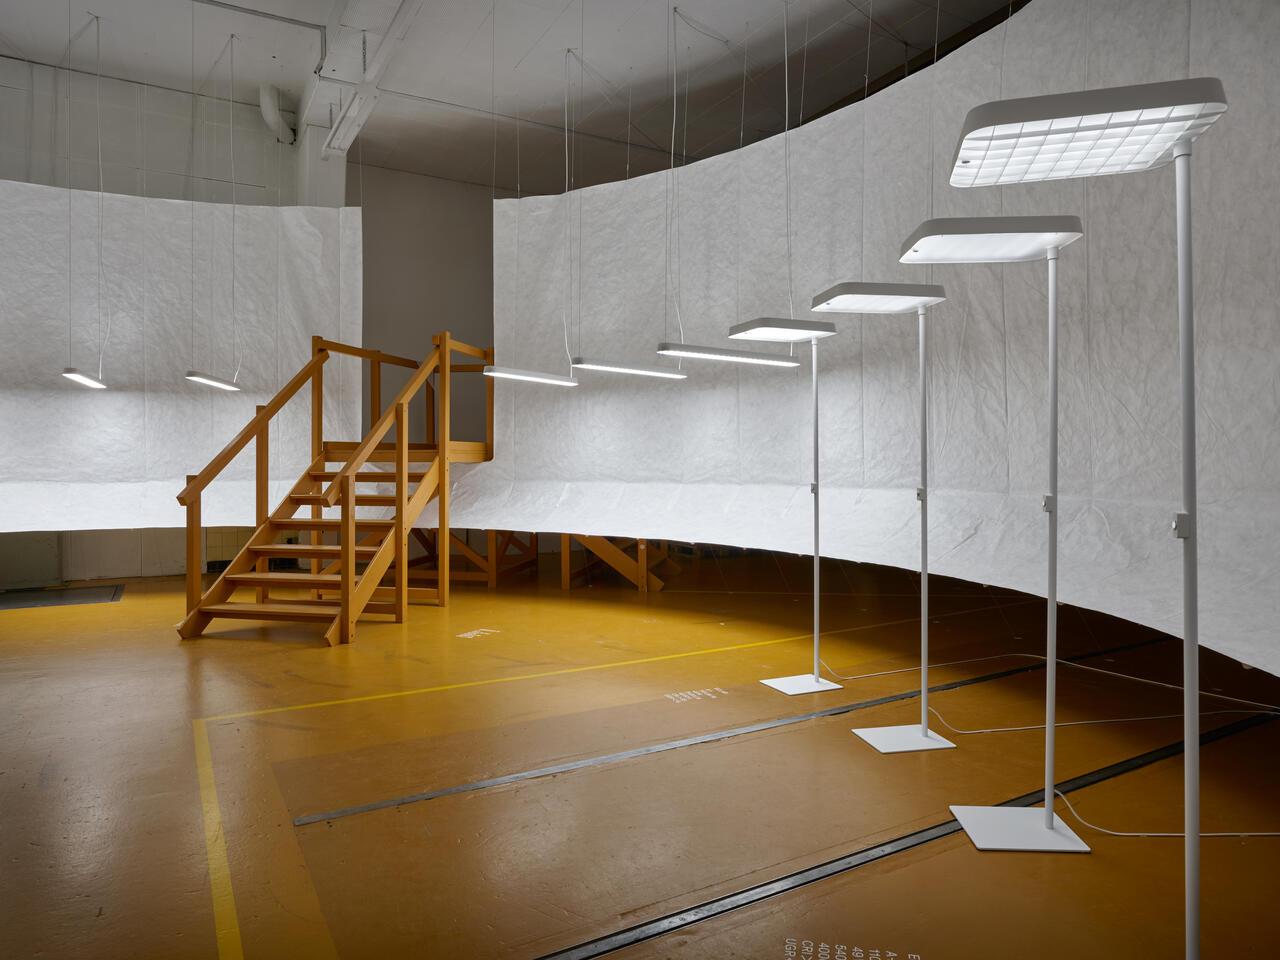 sch tti leuchten designers 39 saturday j rg boner productdesign. Black Bedroom Furniture Sets. Home Design Ideas